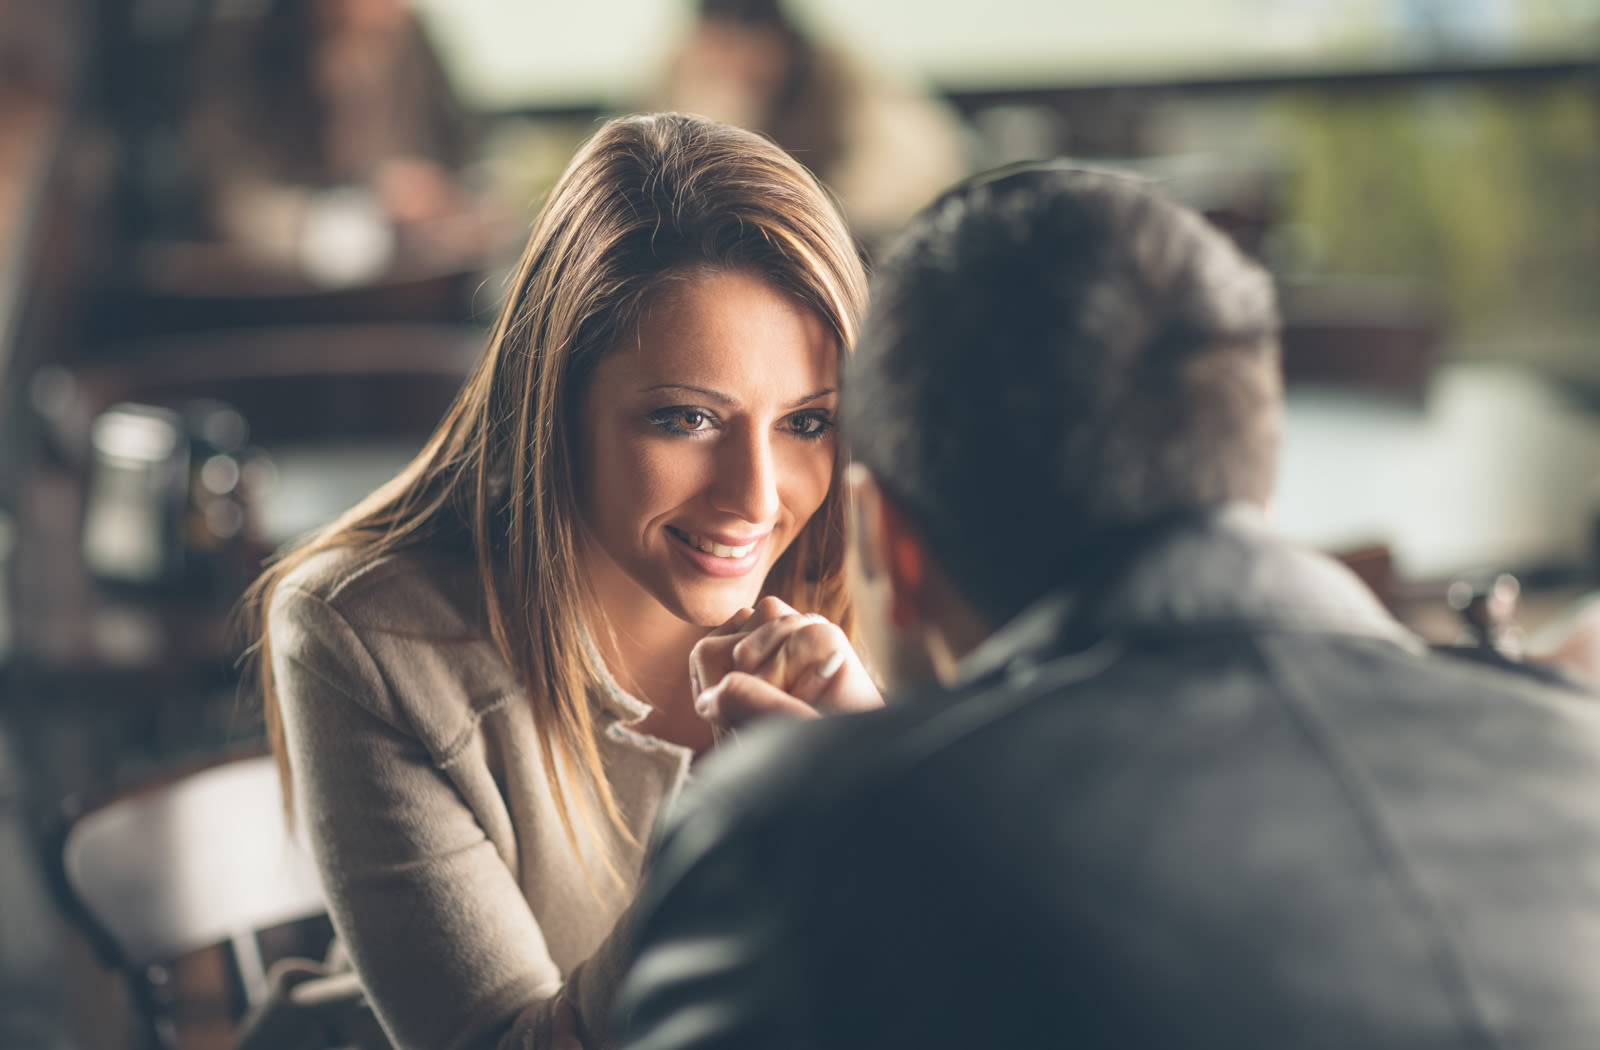 Jazda autobusem online dating